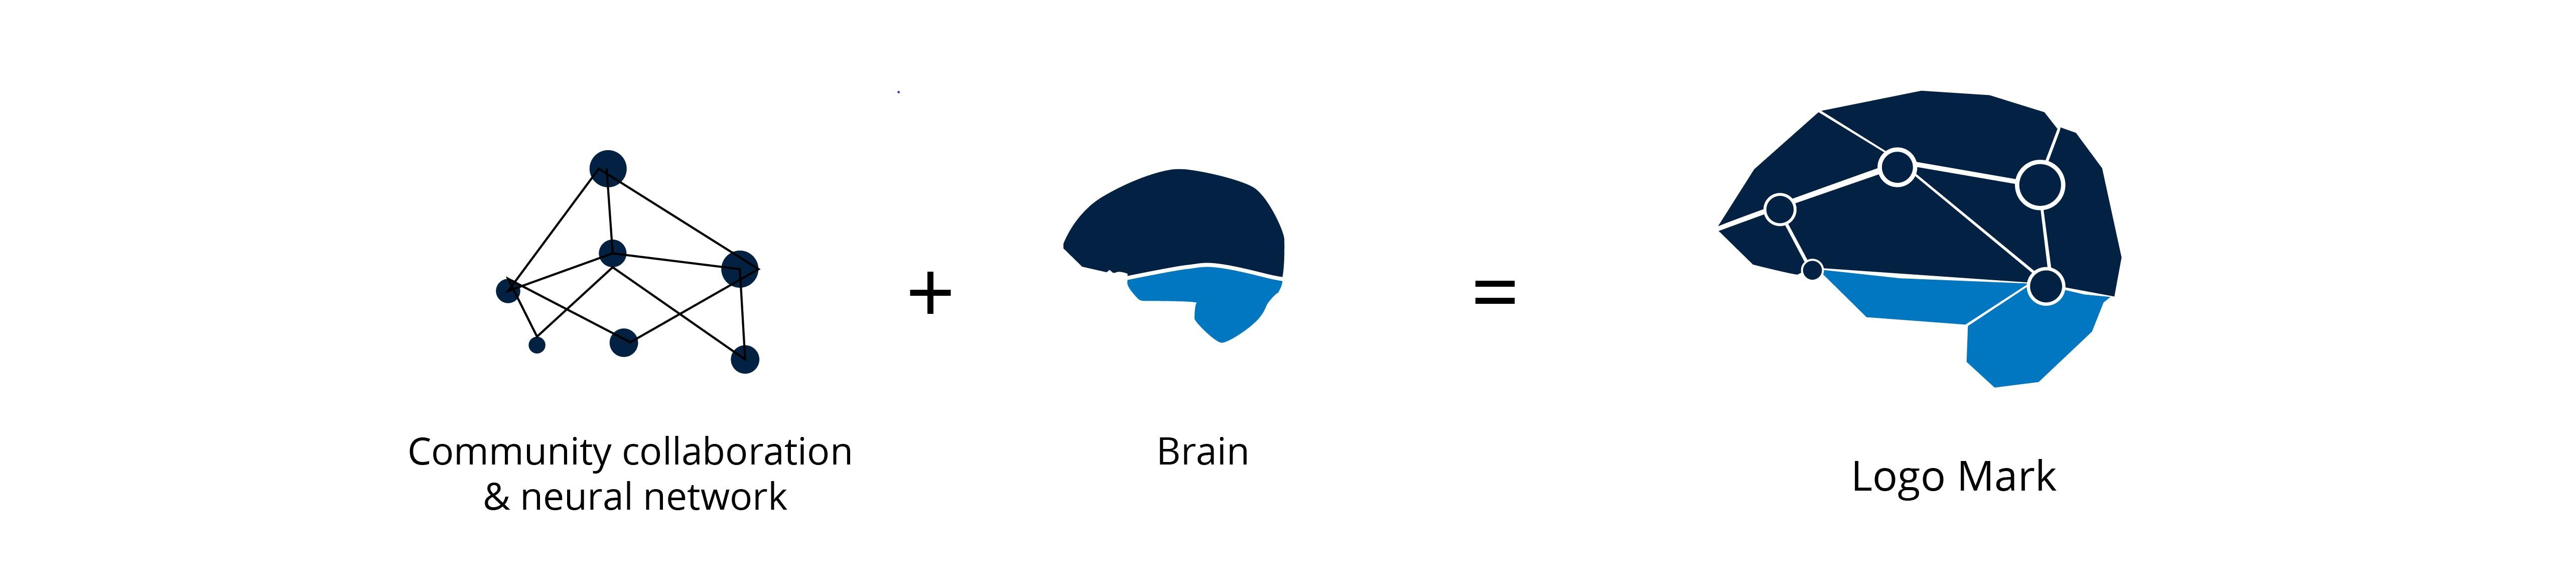 AI School Logo Representation